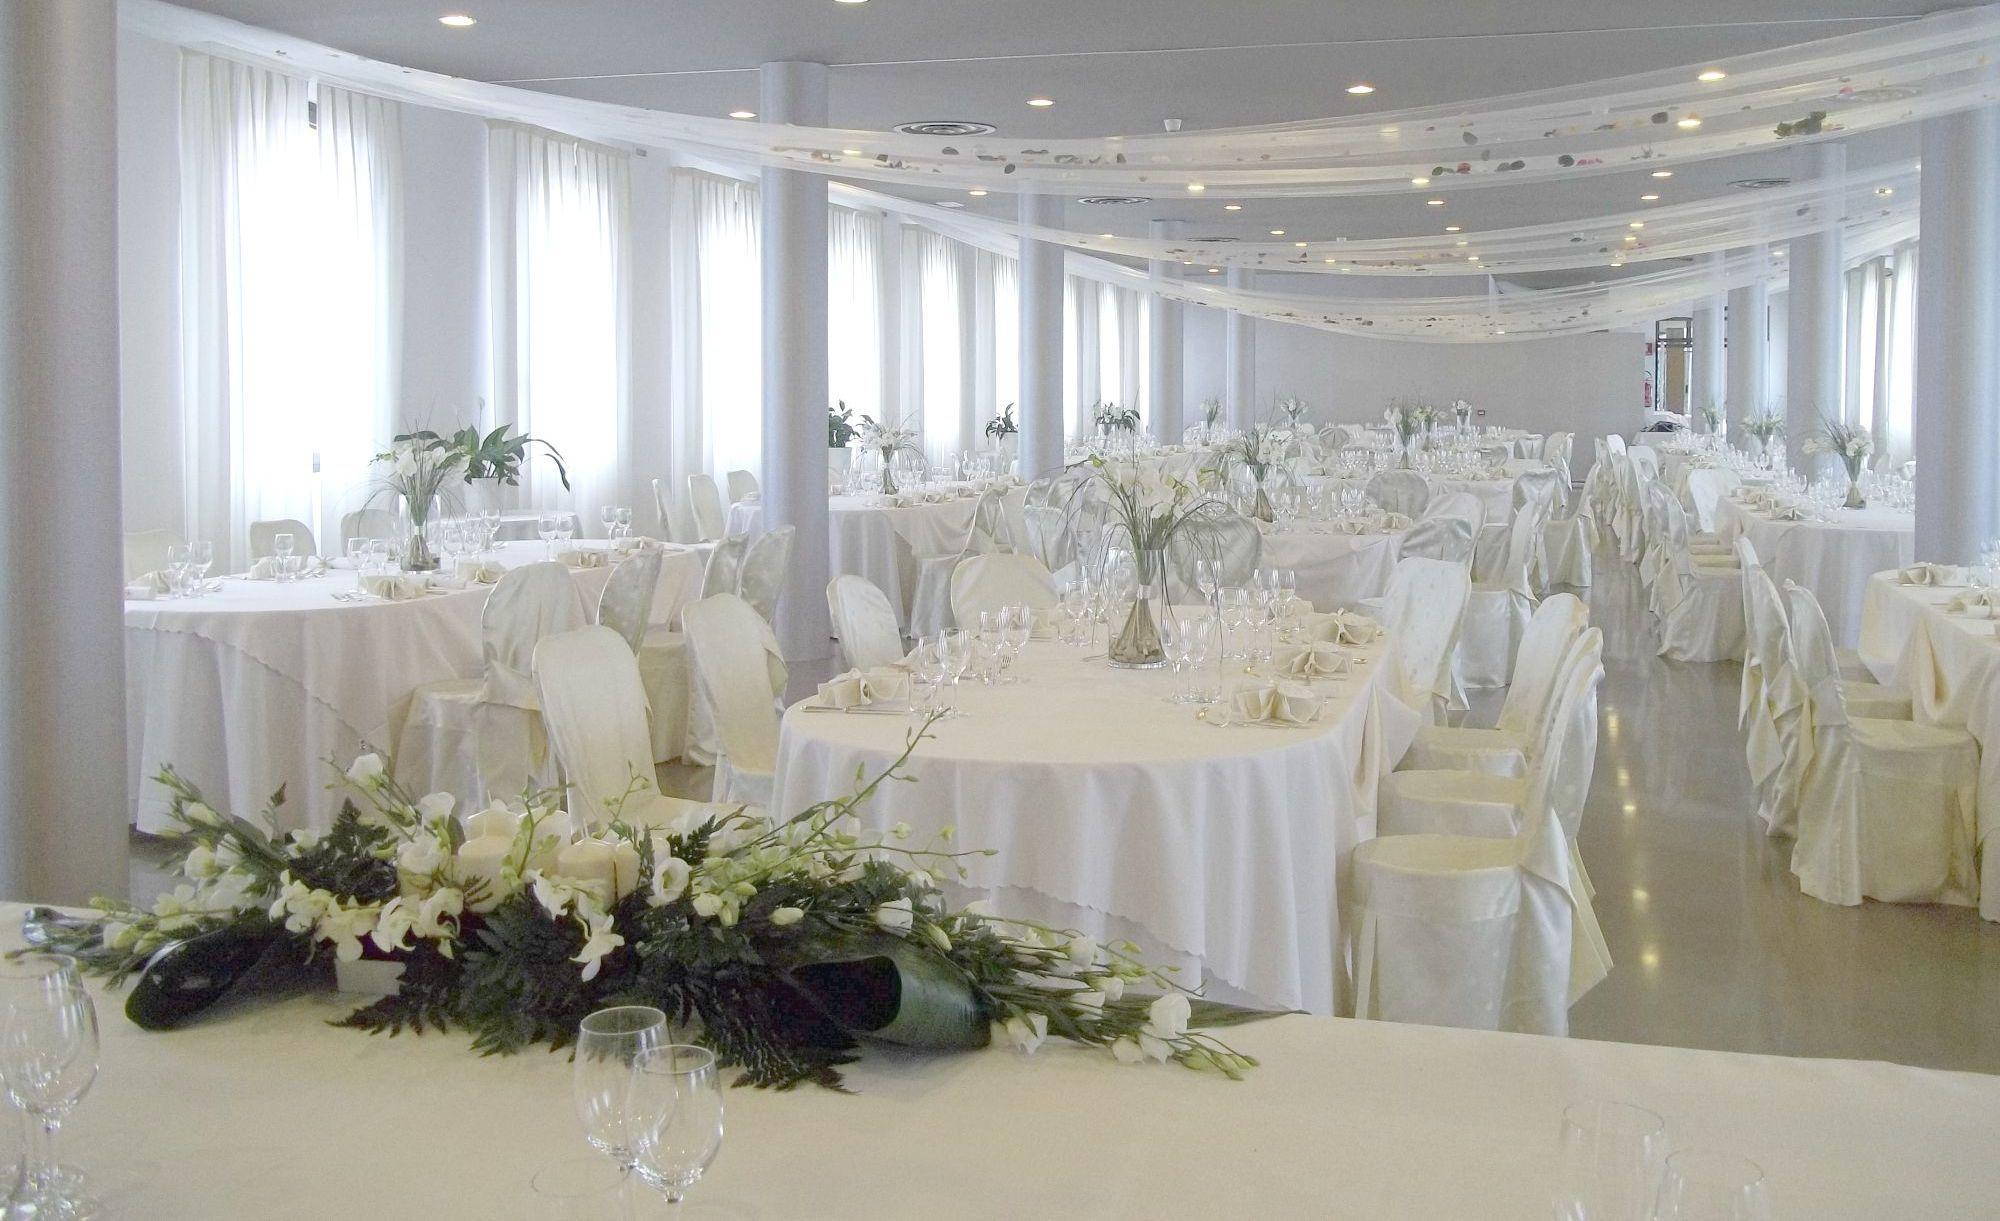 WEDDING DAY  #ristoranteilfilandino #ilfilandino #hotelfilanda #cittadella #padova #italianwedding #wedding #totalwhite #matrimonio